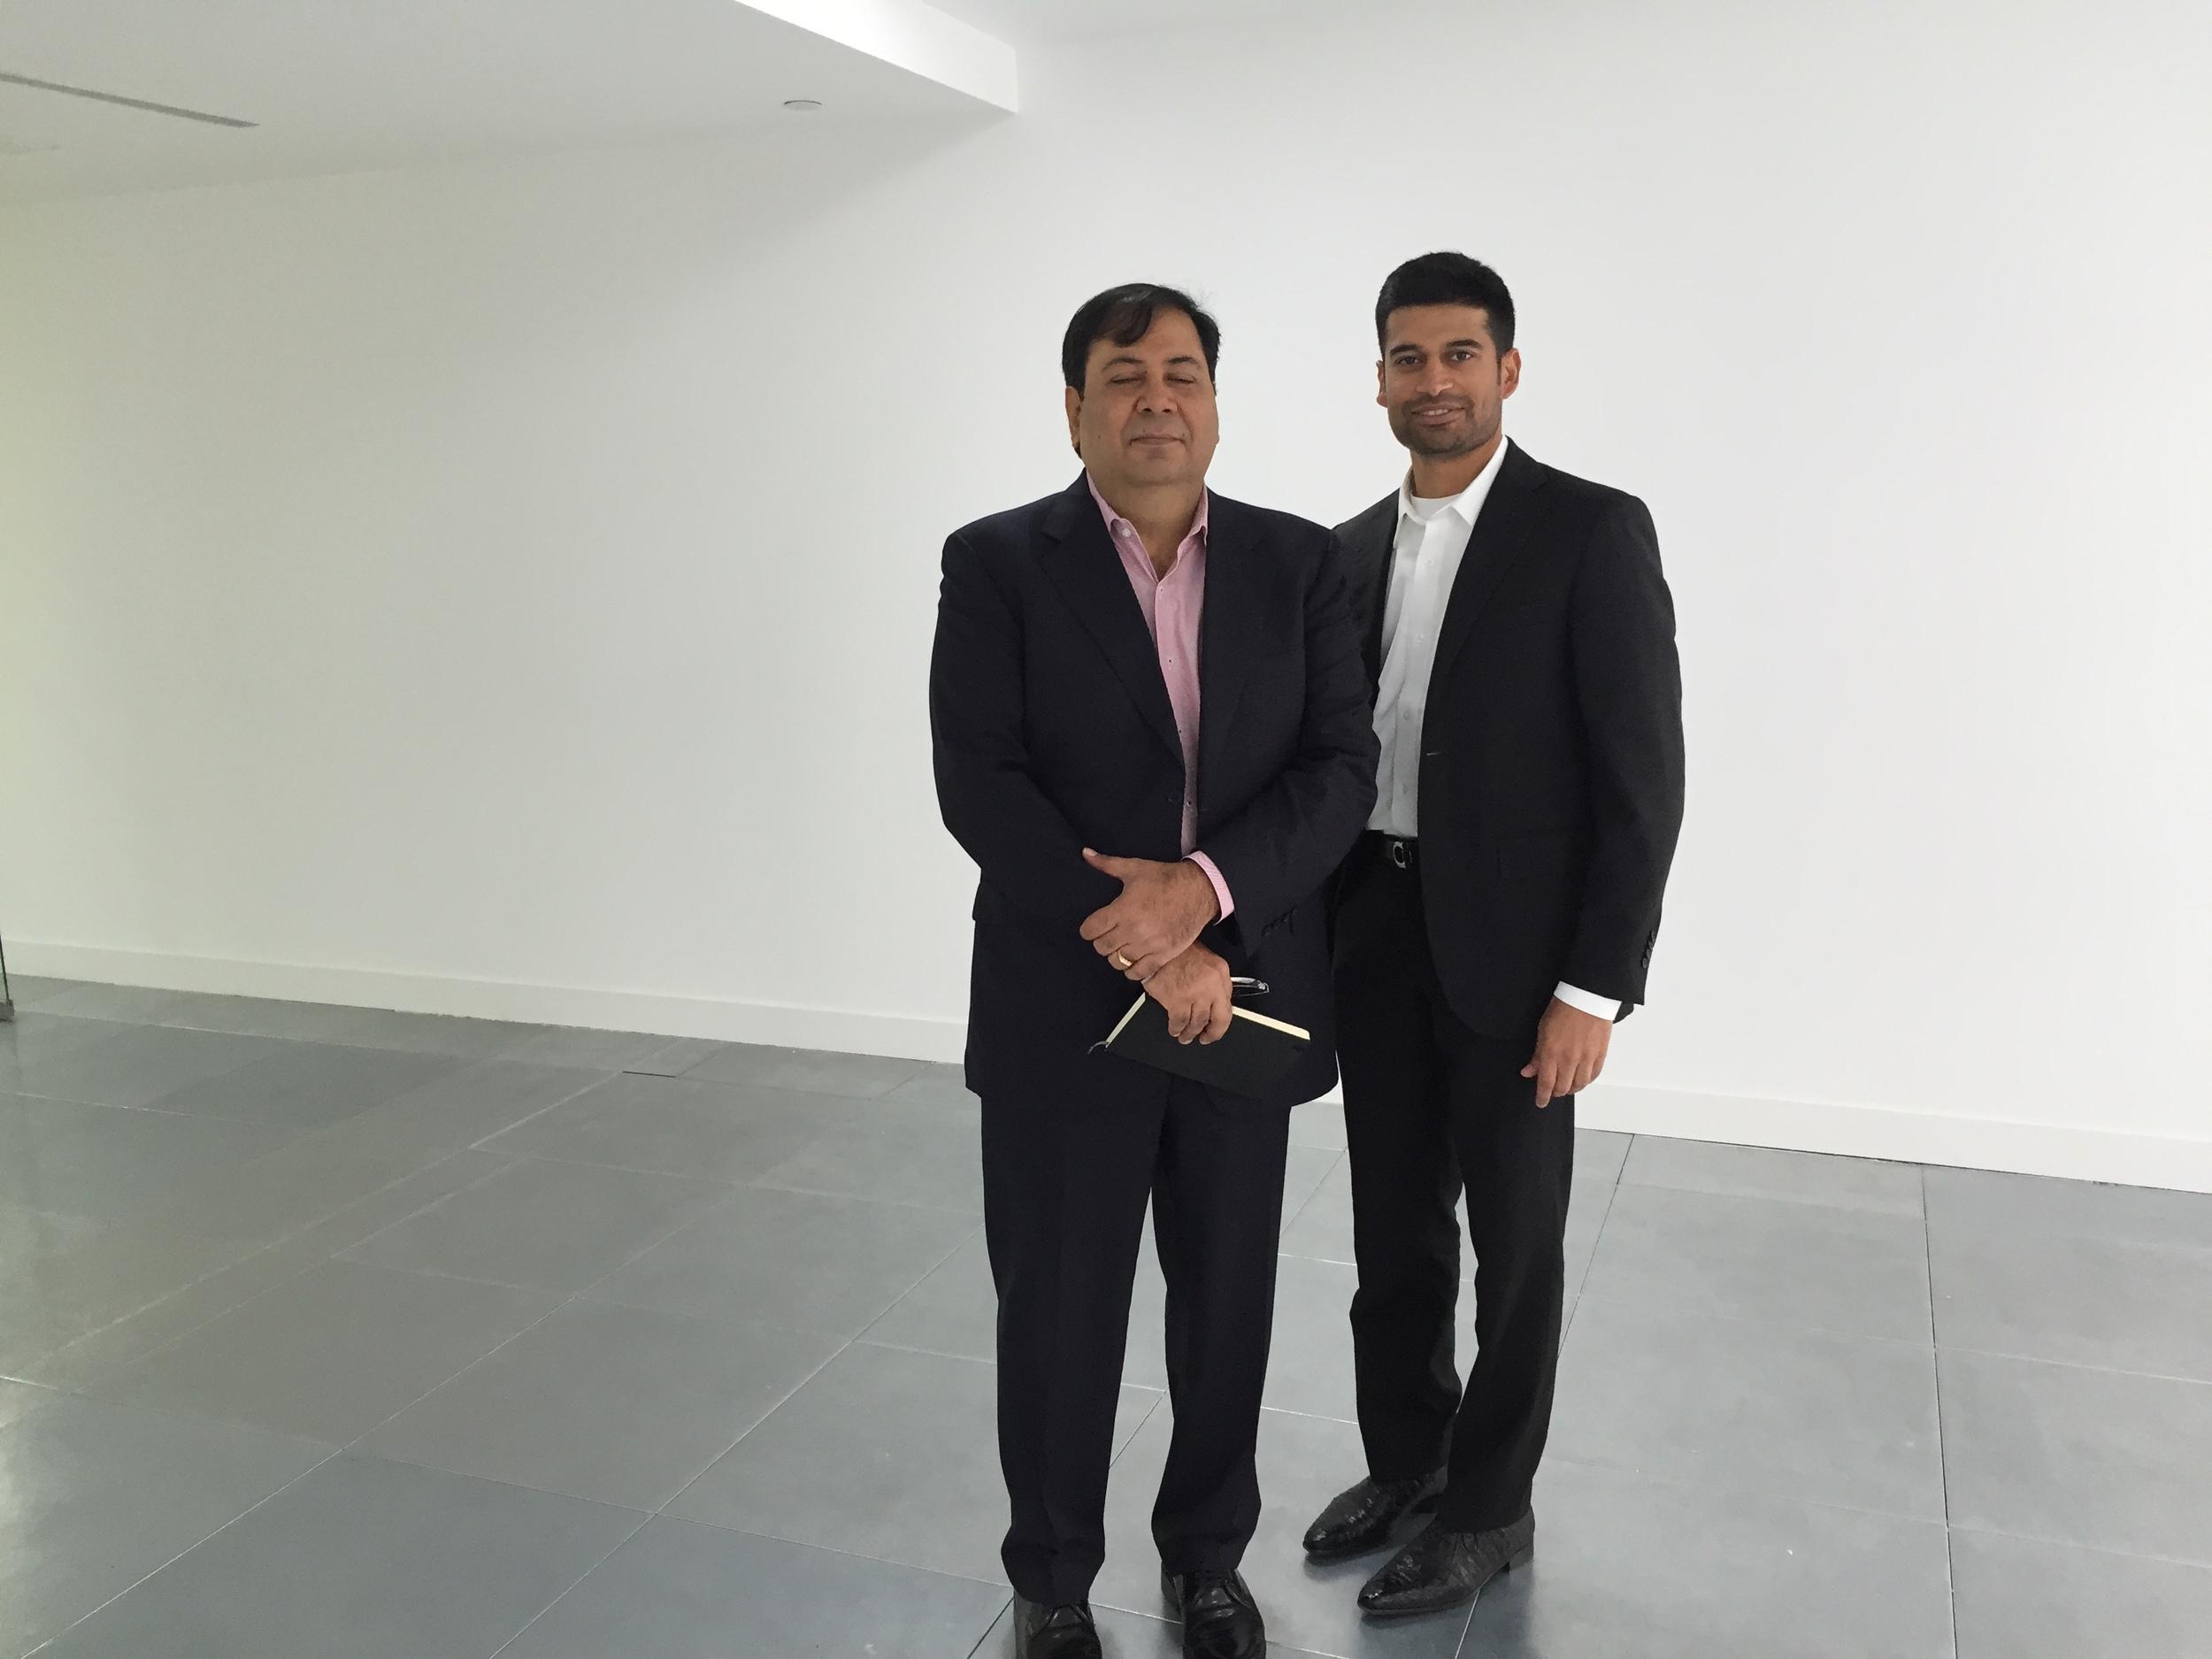 (Left to Right): Mr. Suresh Nichani andMr. Ravi PNC Menon